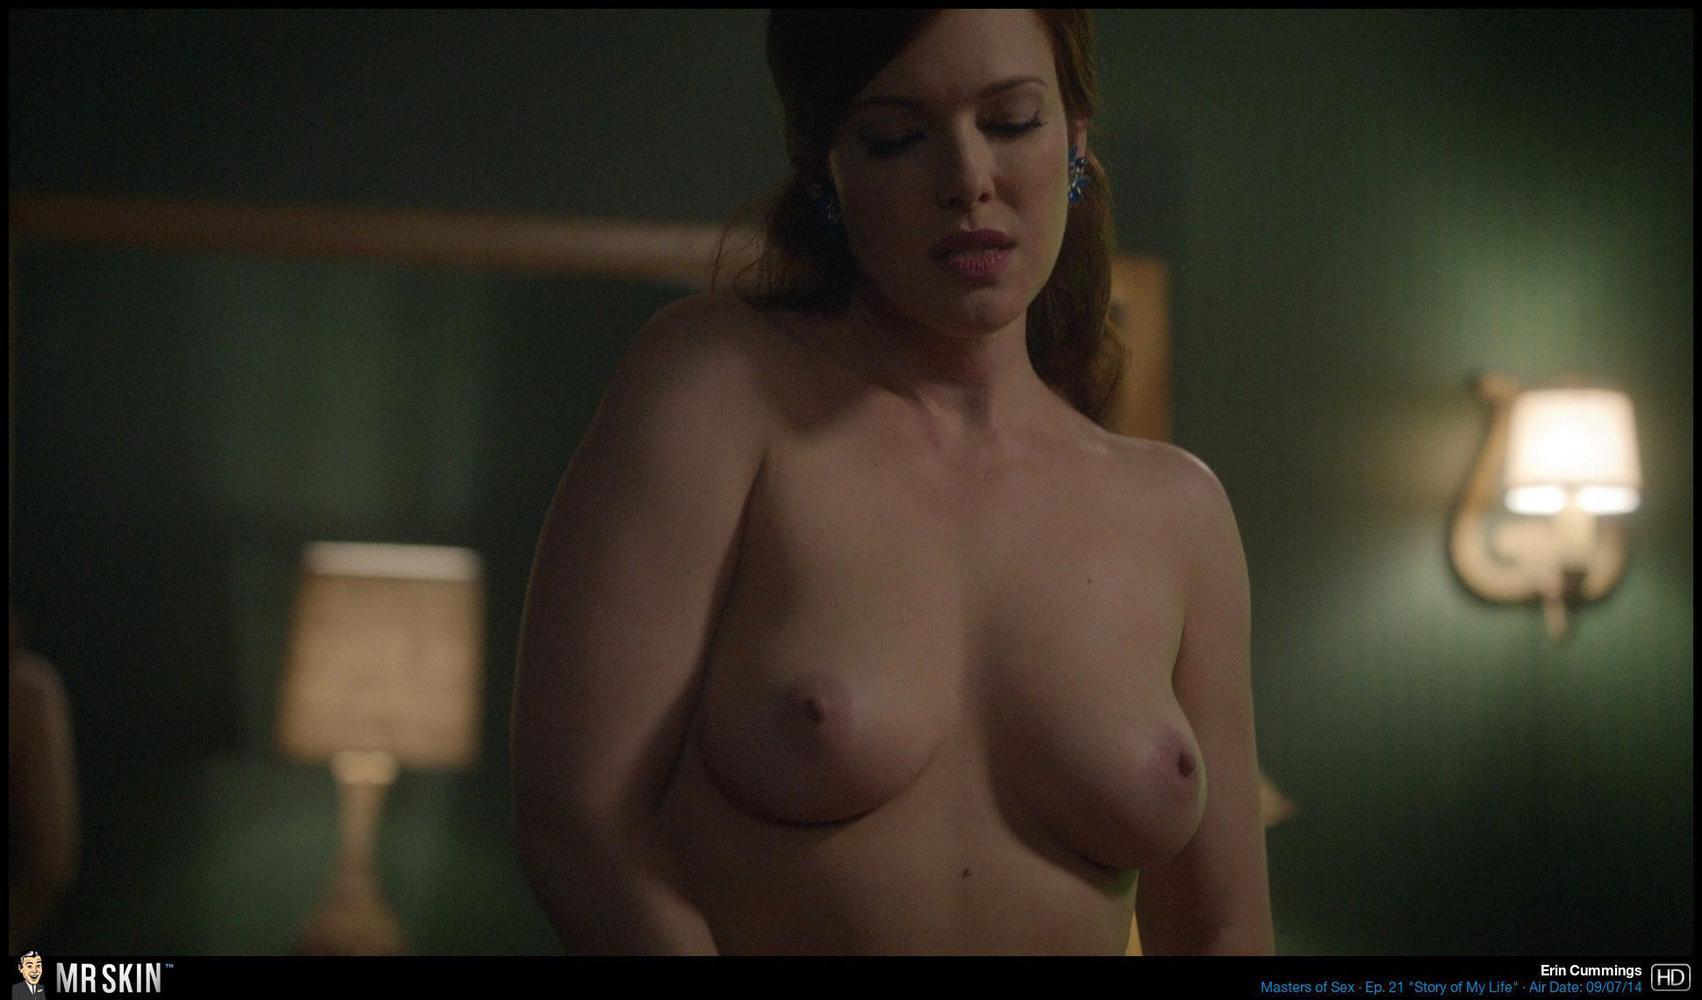 Danneel harris porn - Danneel ackles porn danneel ackles naked pussy xxx  danneel porn danneel porn